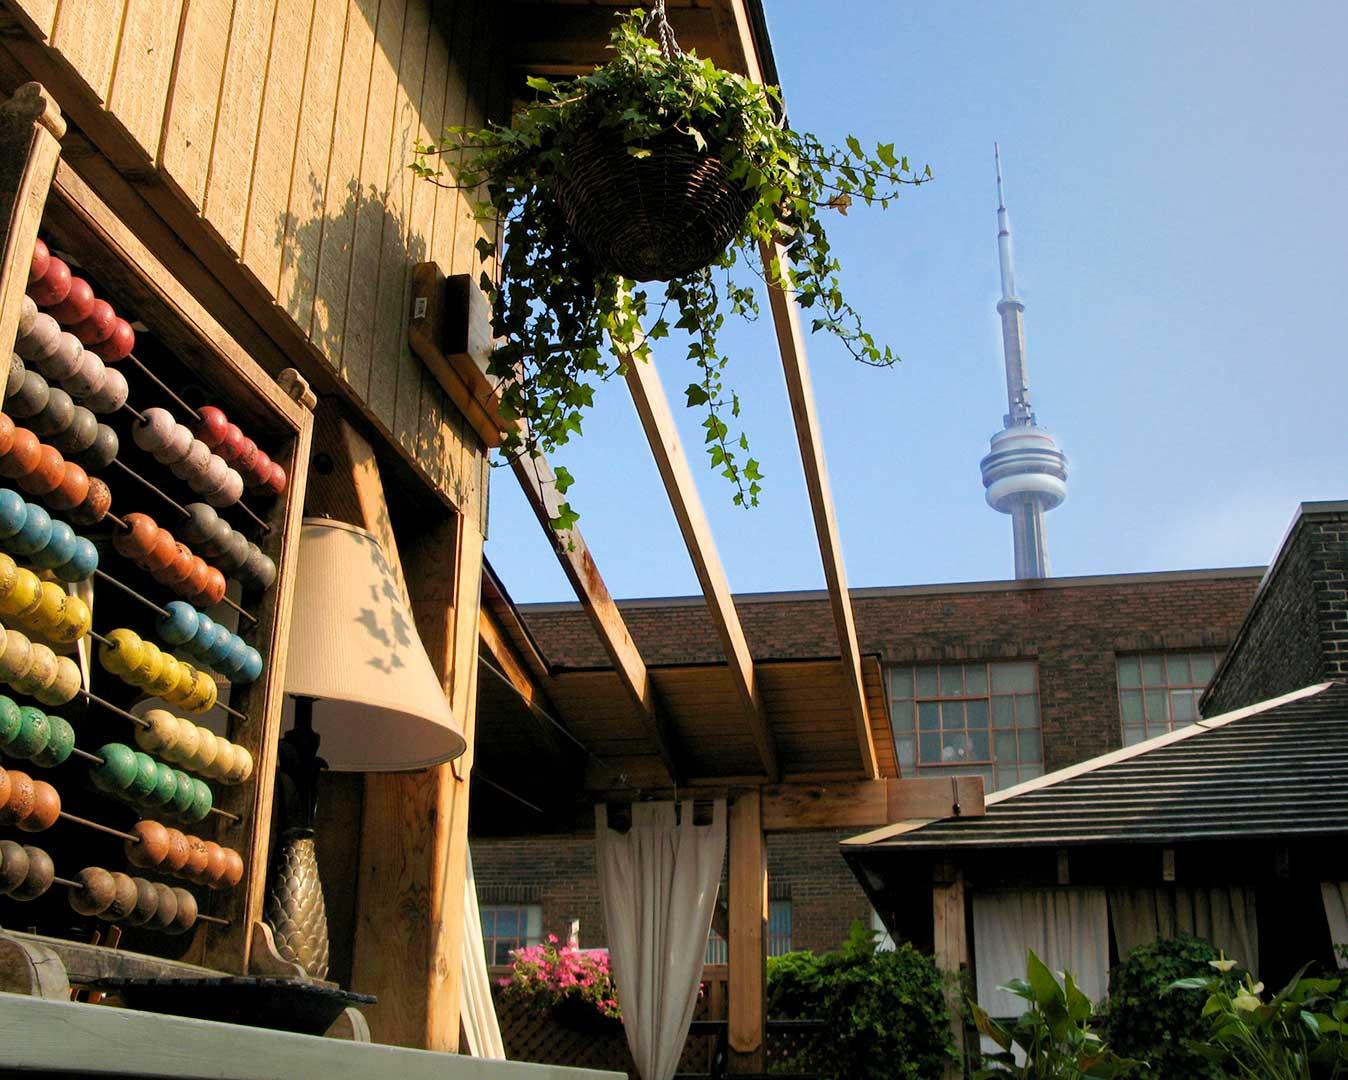 Unique Rooftop Event Venue Toronto for Summer Patio Parties